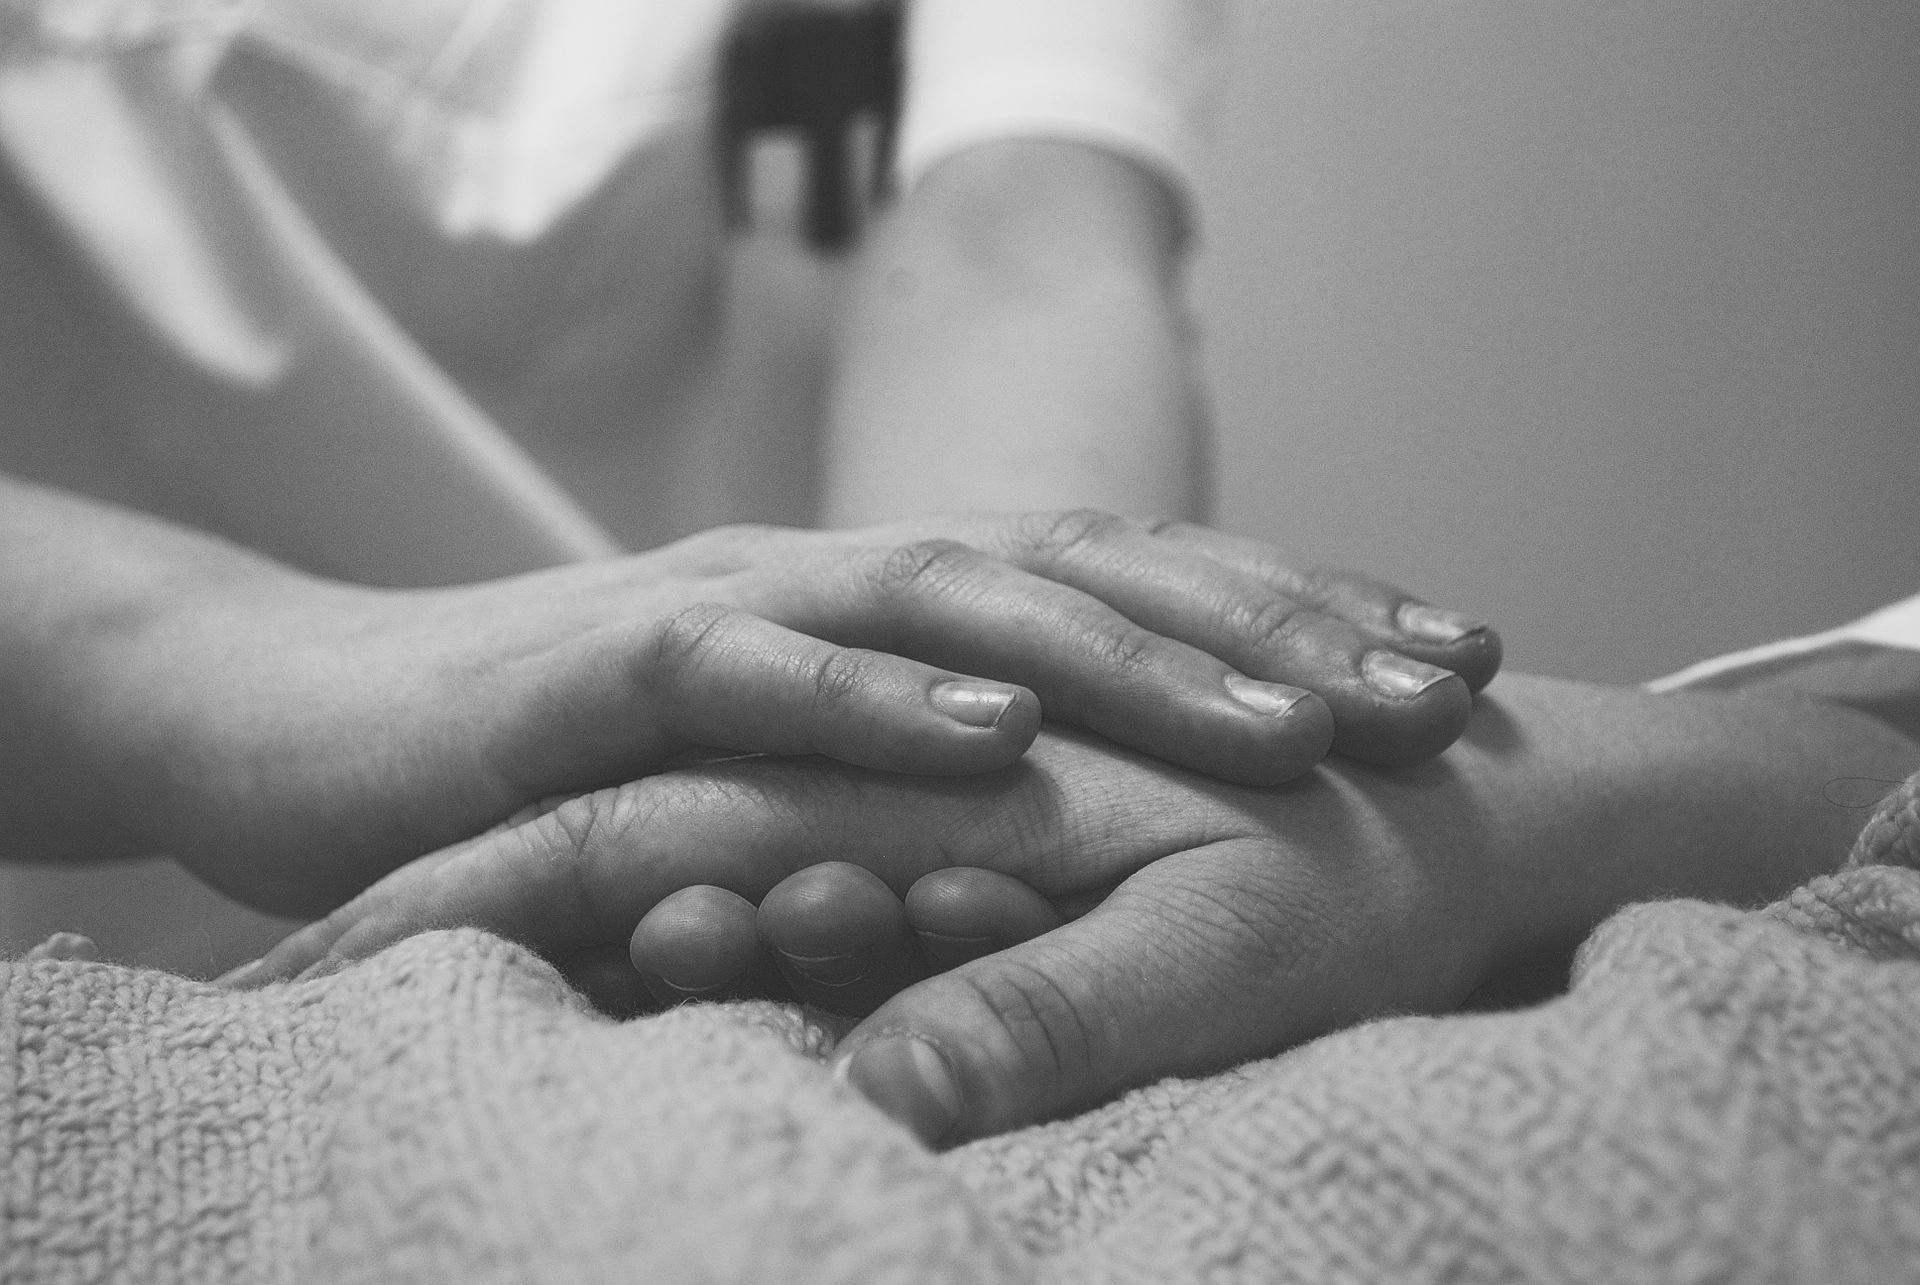 mitigating birth trauma - How You Can Help Prevent Postpartum PTSD